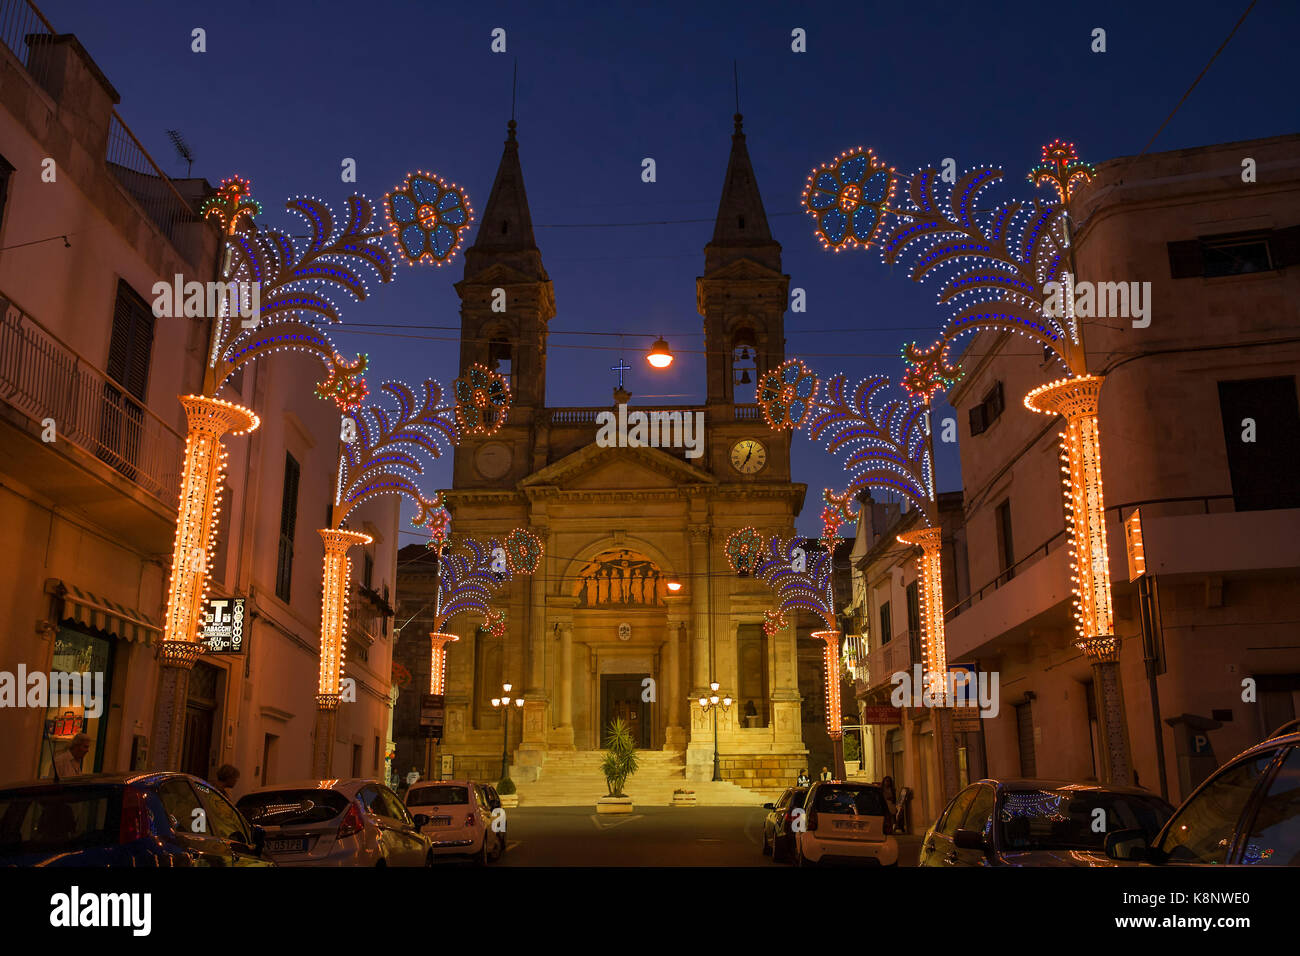 The duomo (cathedral) on Piazza Curri in late evening, Alberobello, Puglia - Stock Image